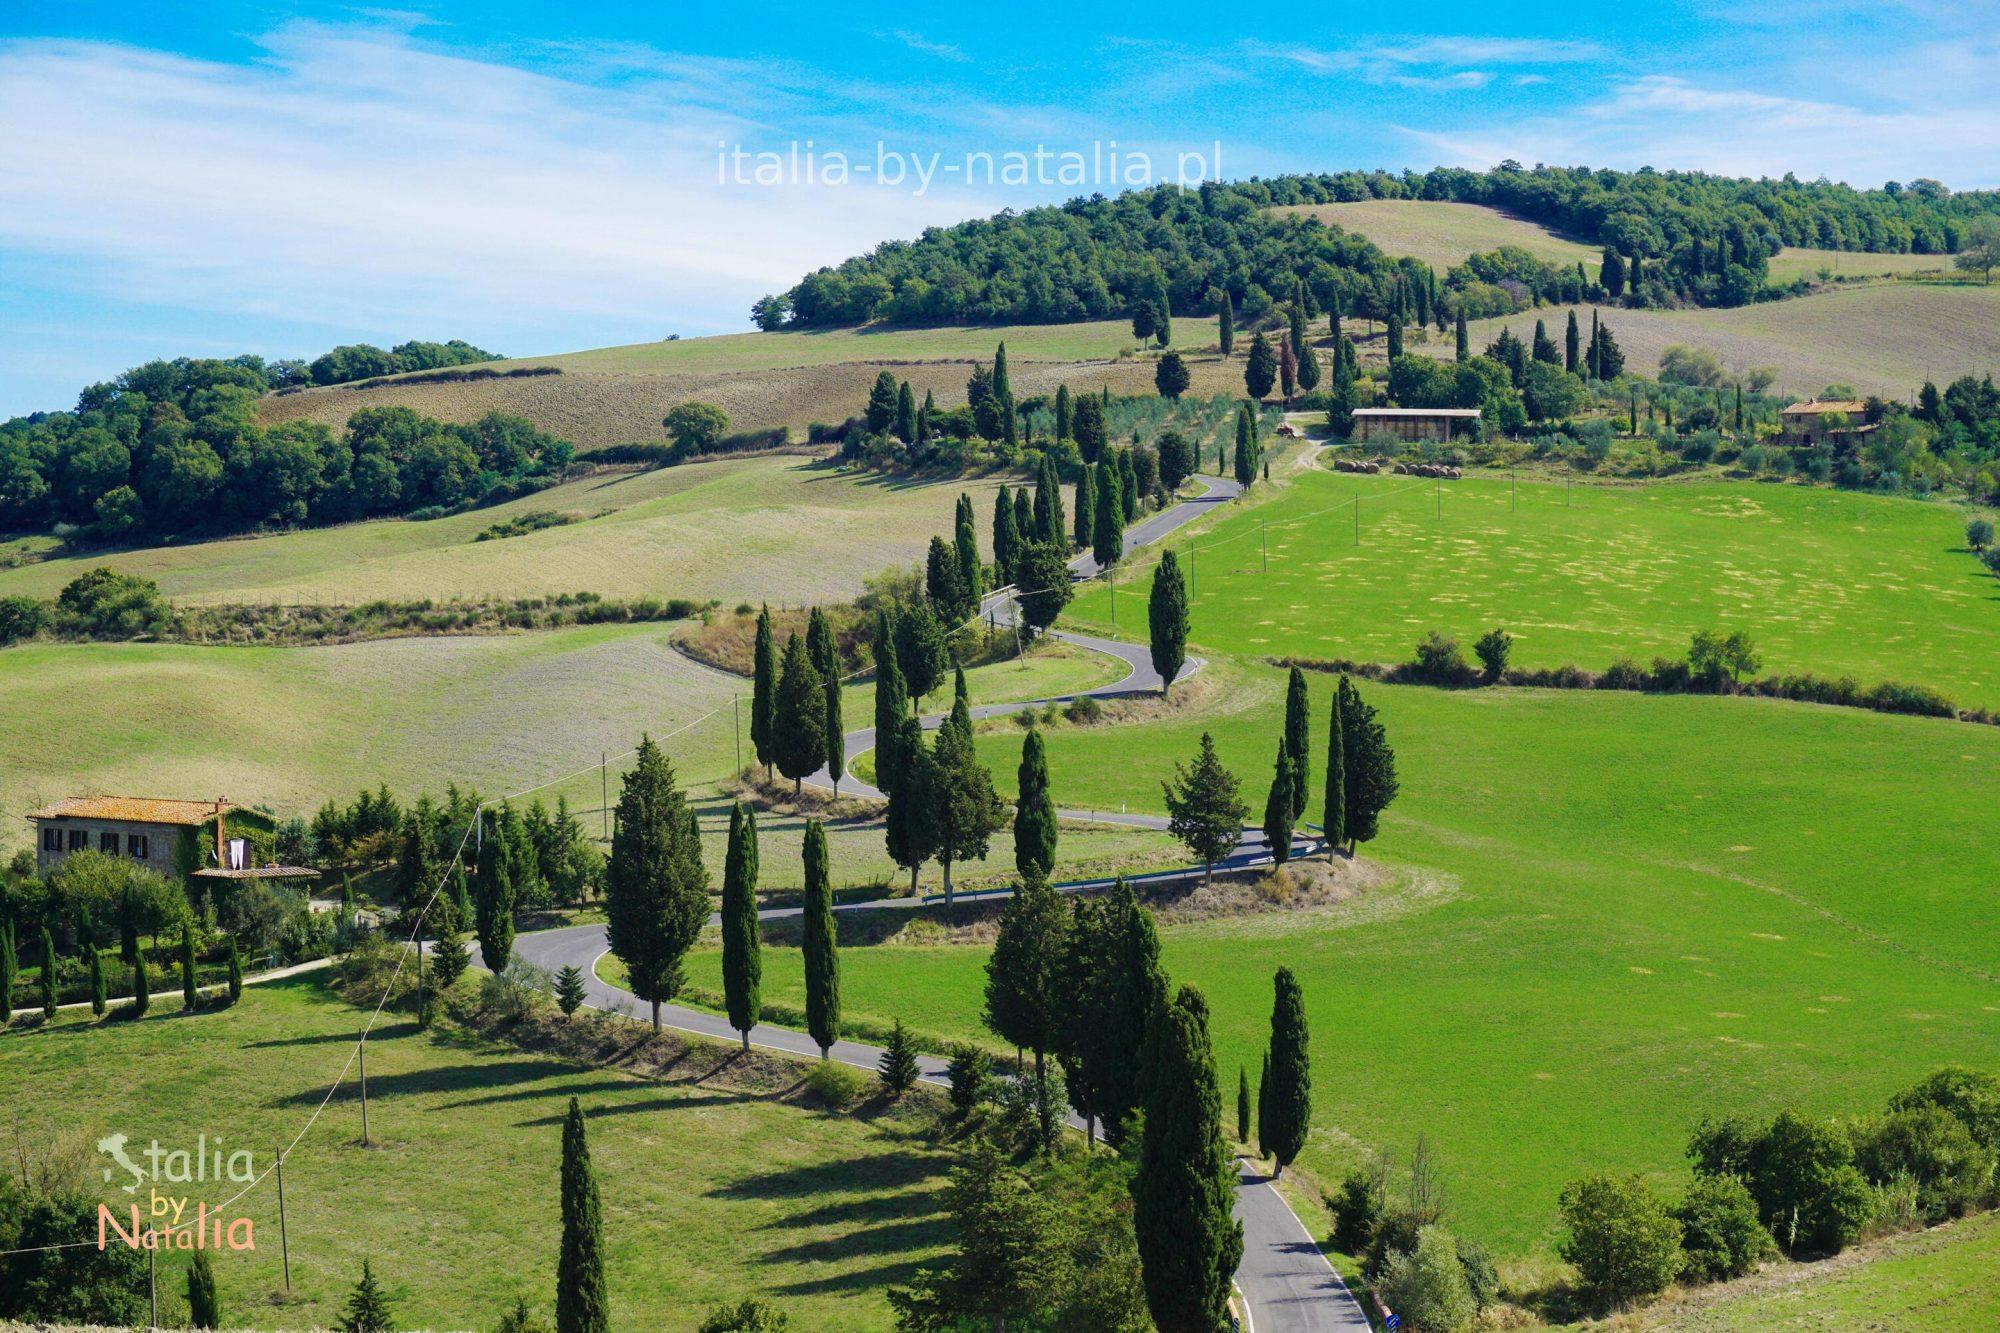 monticchiello cyprysowa droga toskania val d'orcia włochy tuscany italy cypresses road